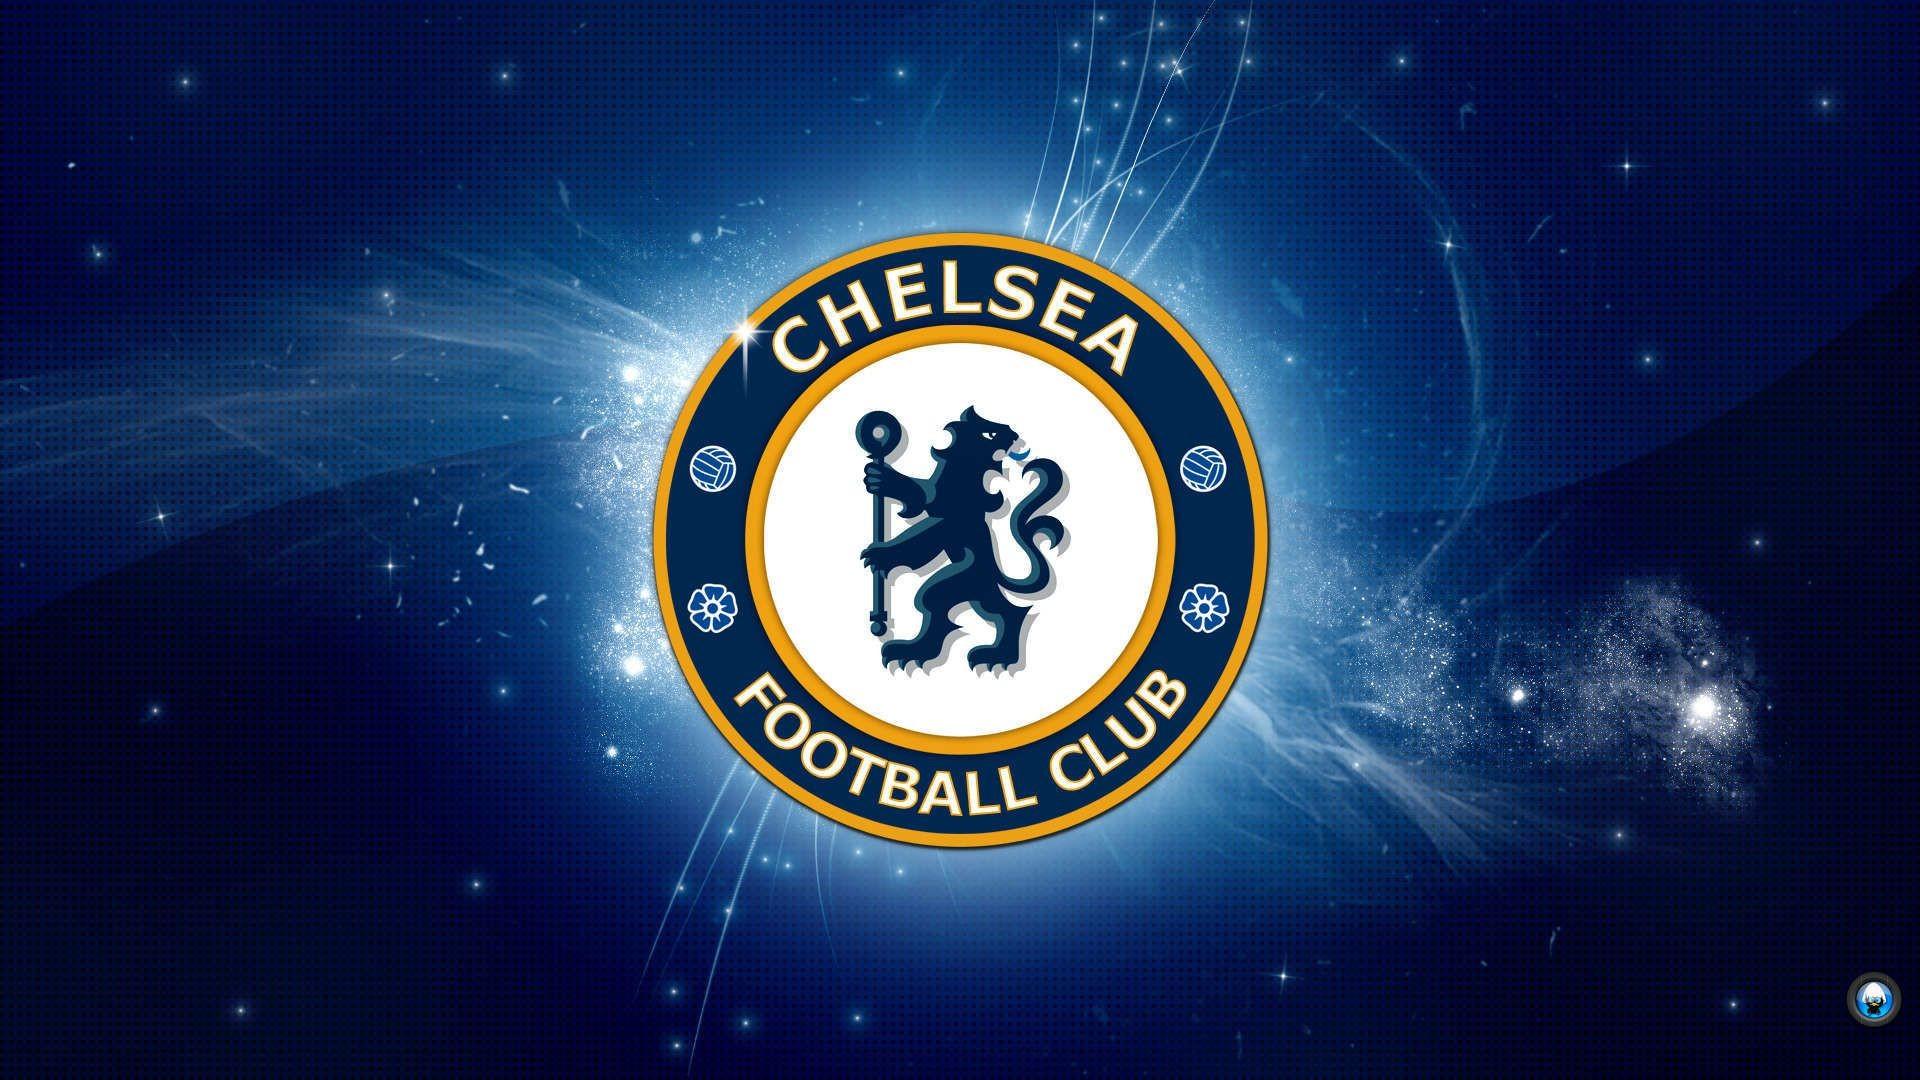 Top Chelsea 2017 HD Wallpaper